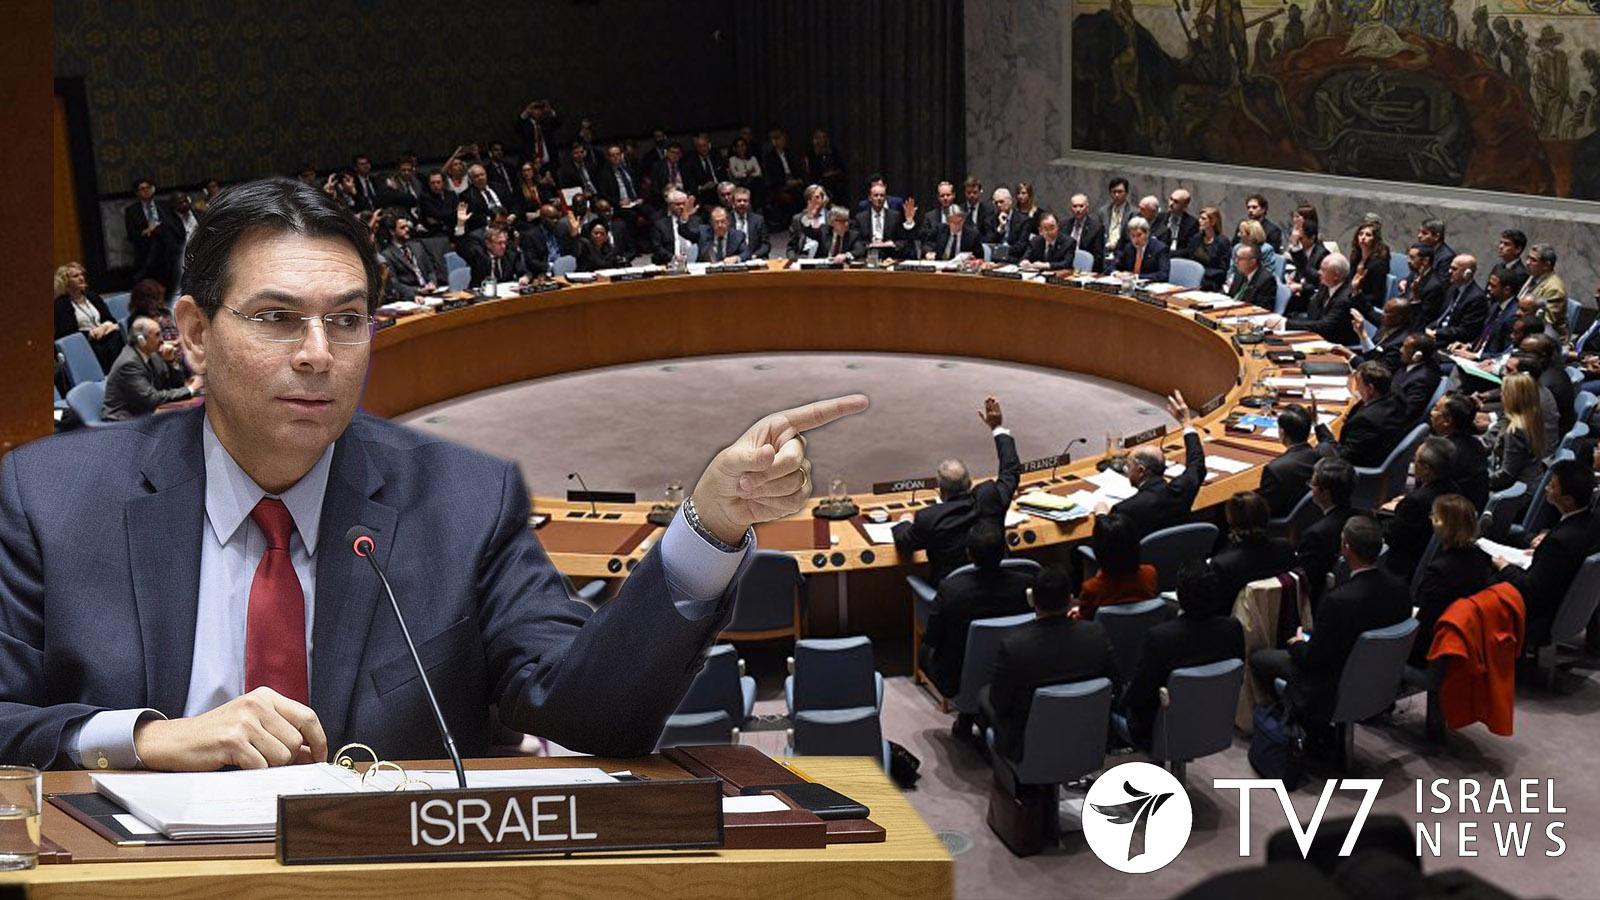 danny danon UN security council on Golan Heights